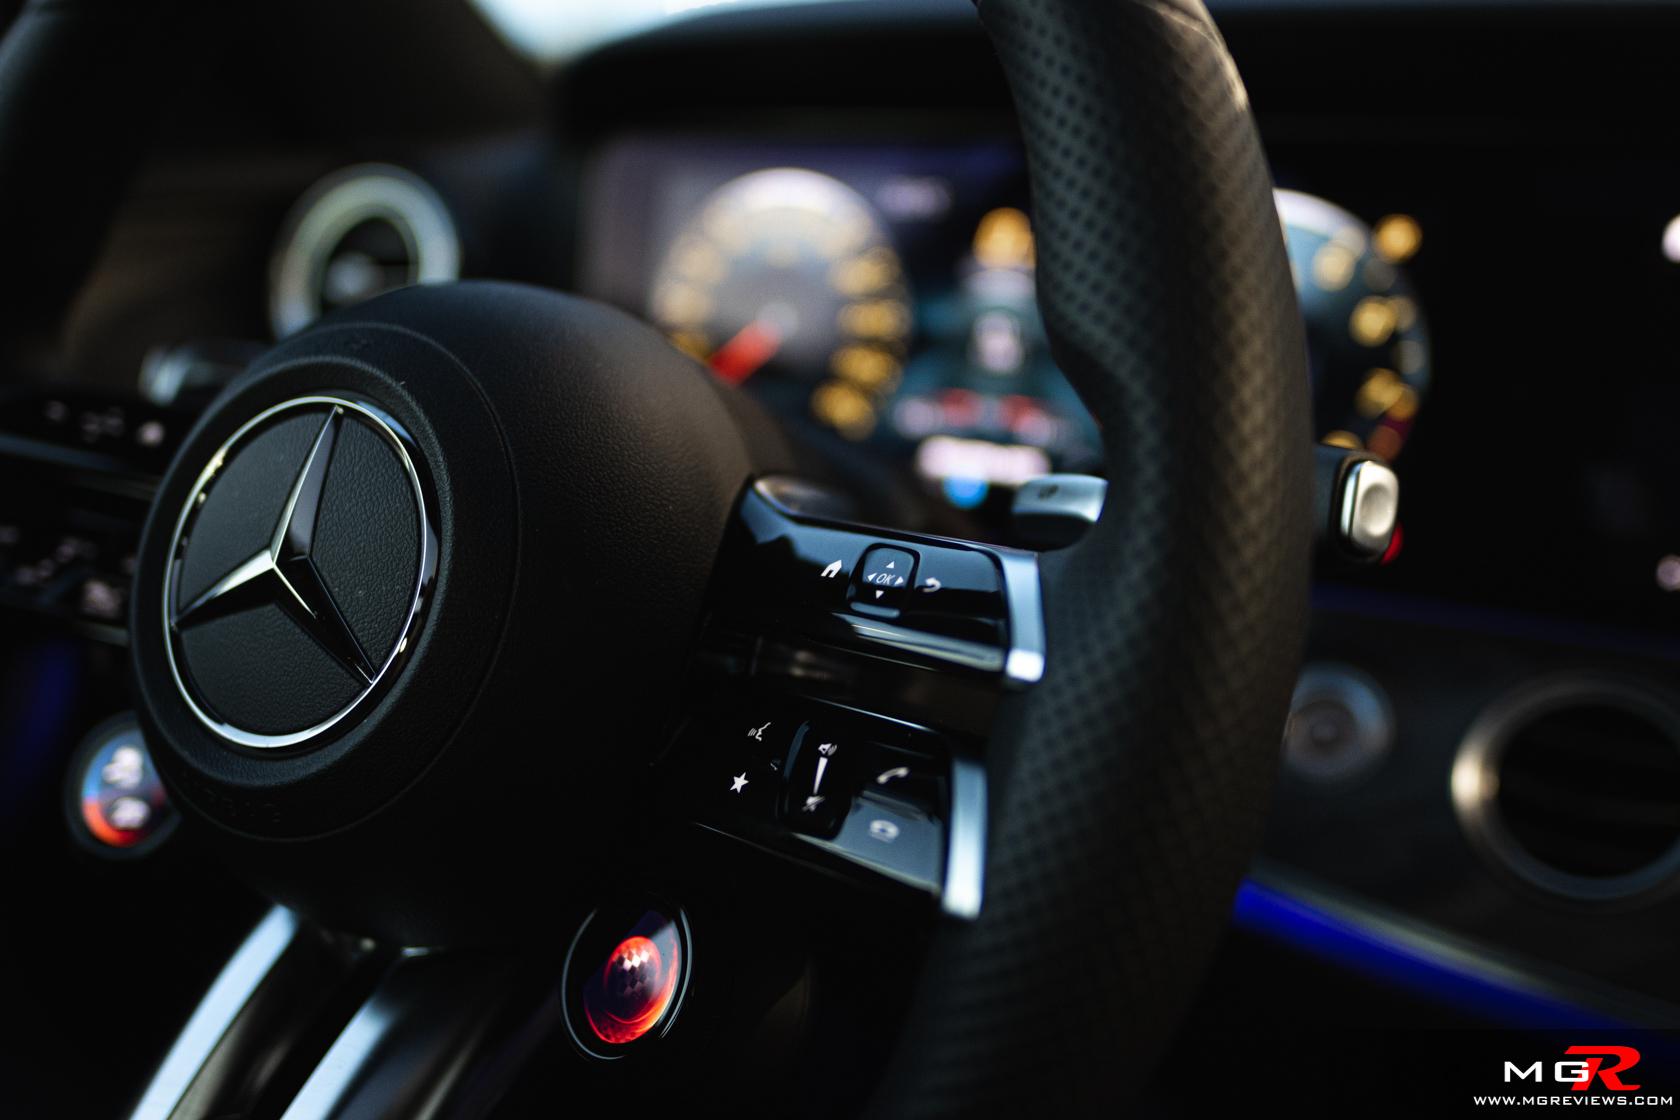 2021 Mercedes-Benz E63 AMG Wagon 4MATIC+ Interior